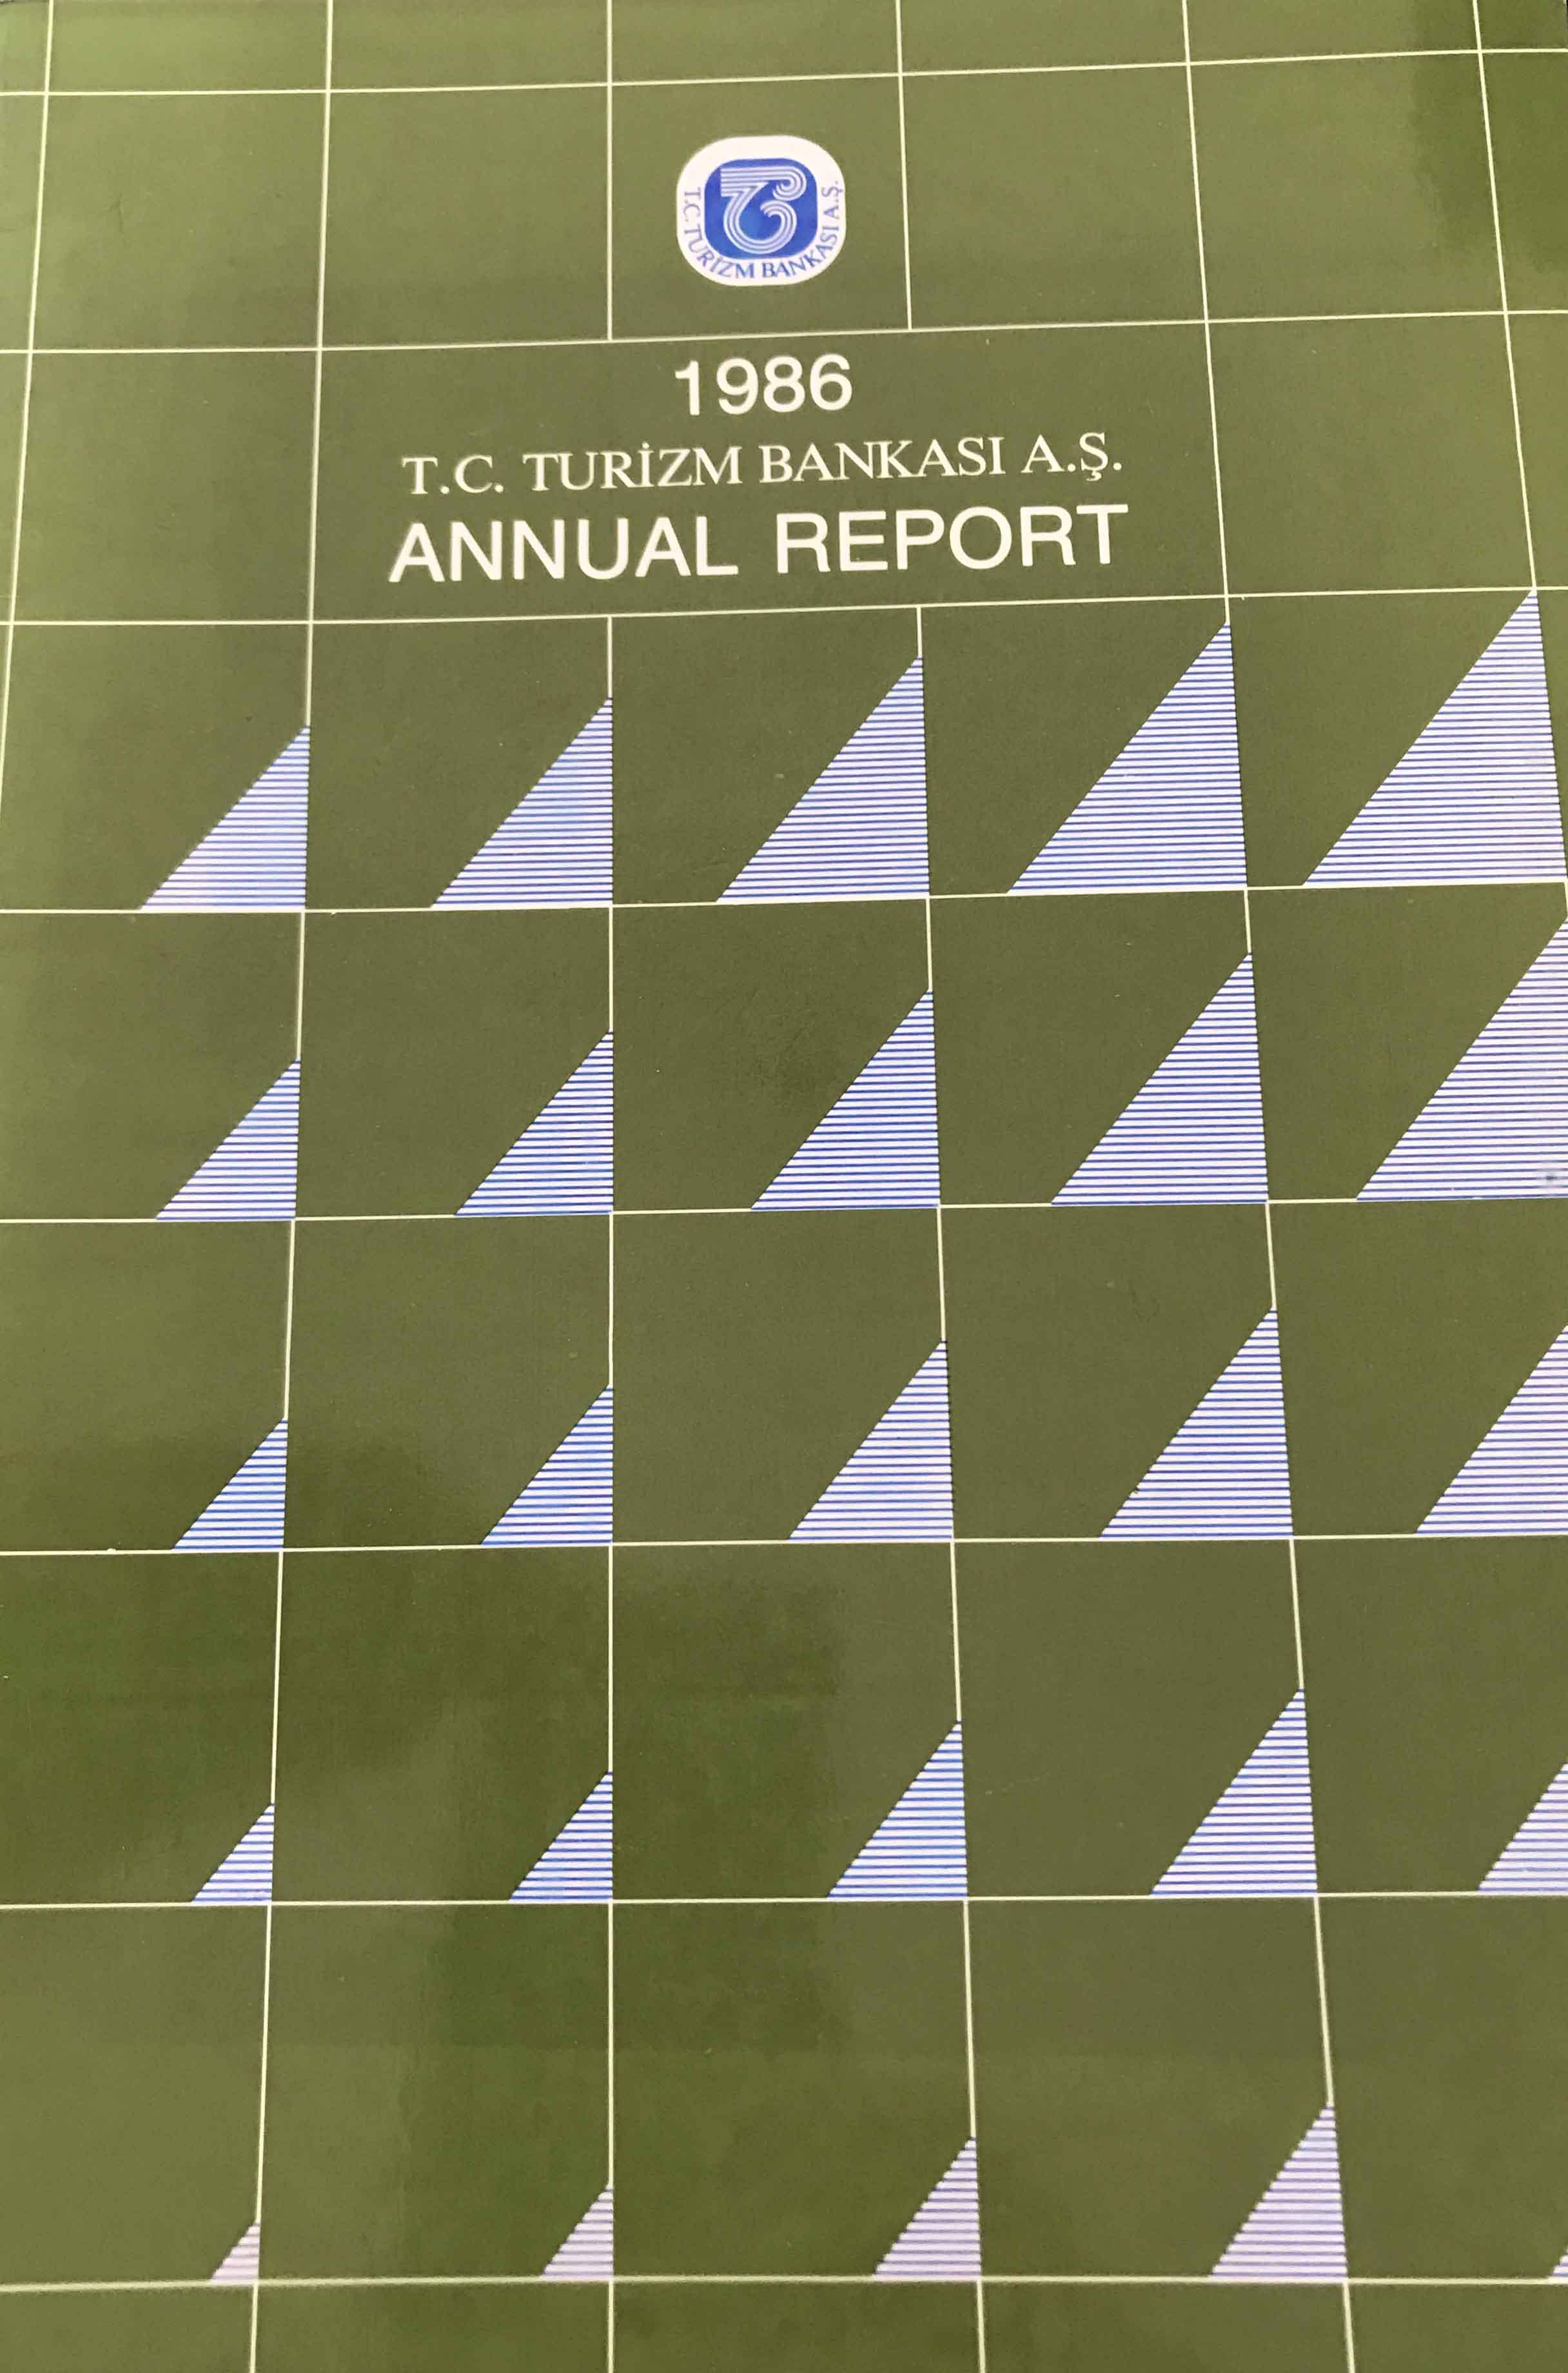 Turizm Bankası Annual Report 1986 Kitap Kapağı